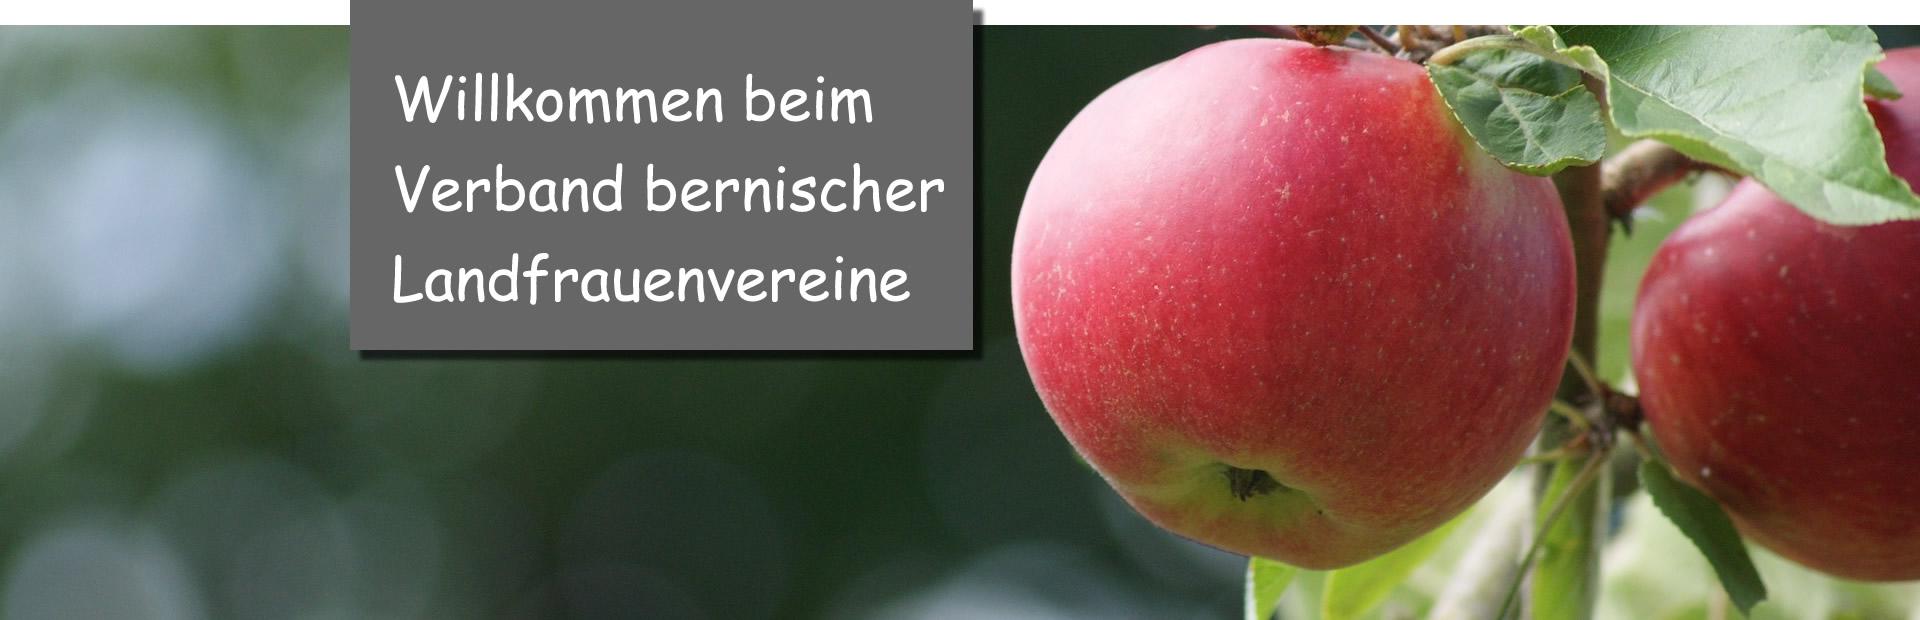 Apfel_willkomm